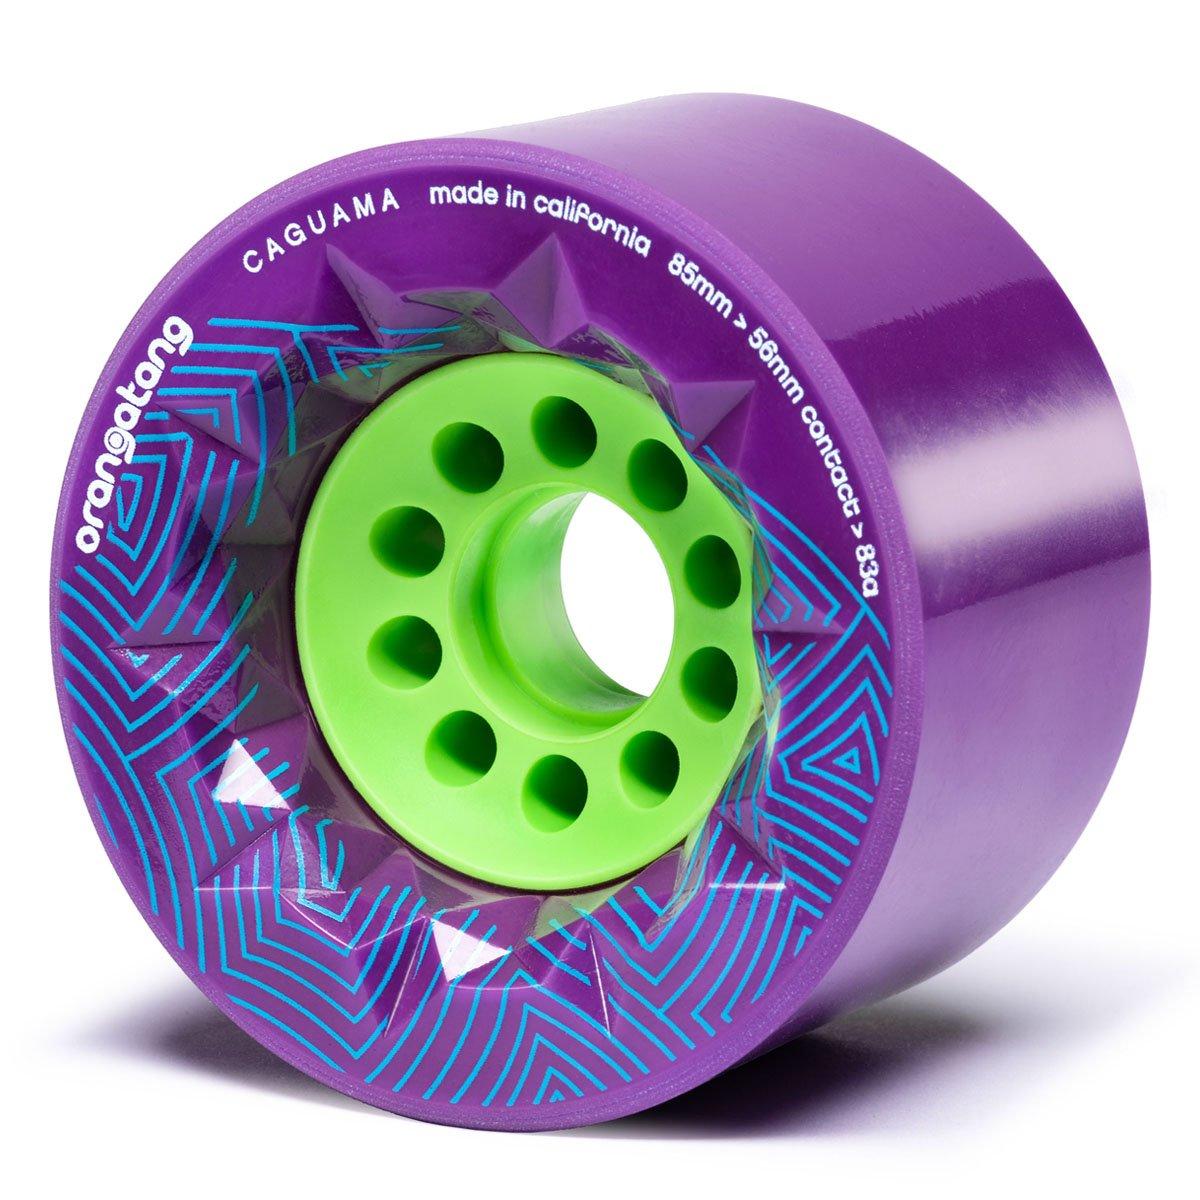 Orangatang Caguama 85 mm 83a Downhill Longboard Skateboard Cruising Wheels w/Loaded Jehu V2 Bearings (Purple, Set of 4) by Orangatang